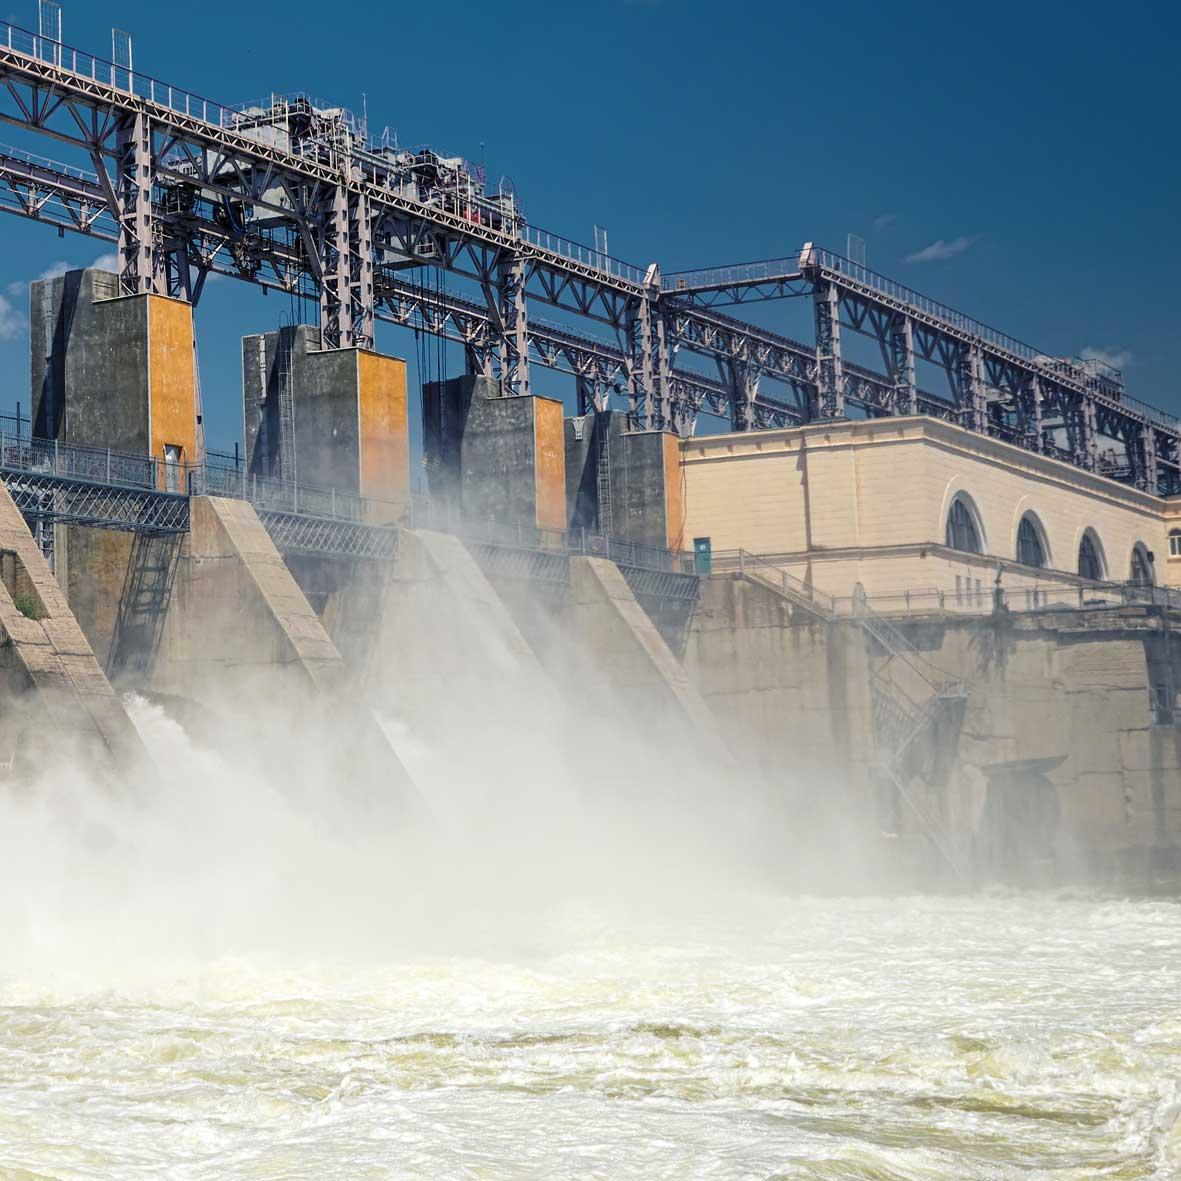 Hydro energy plant